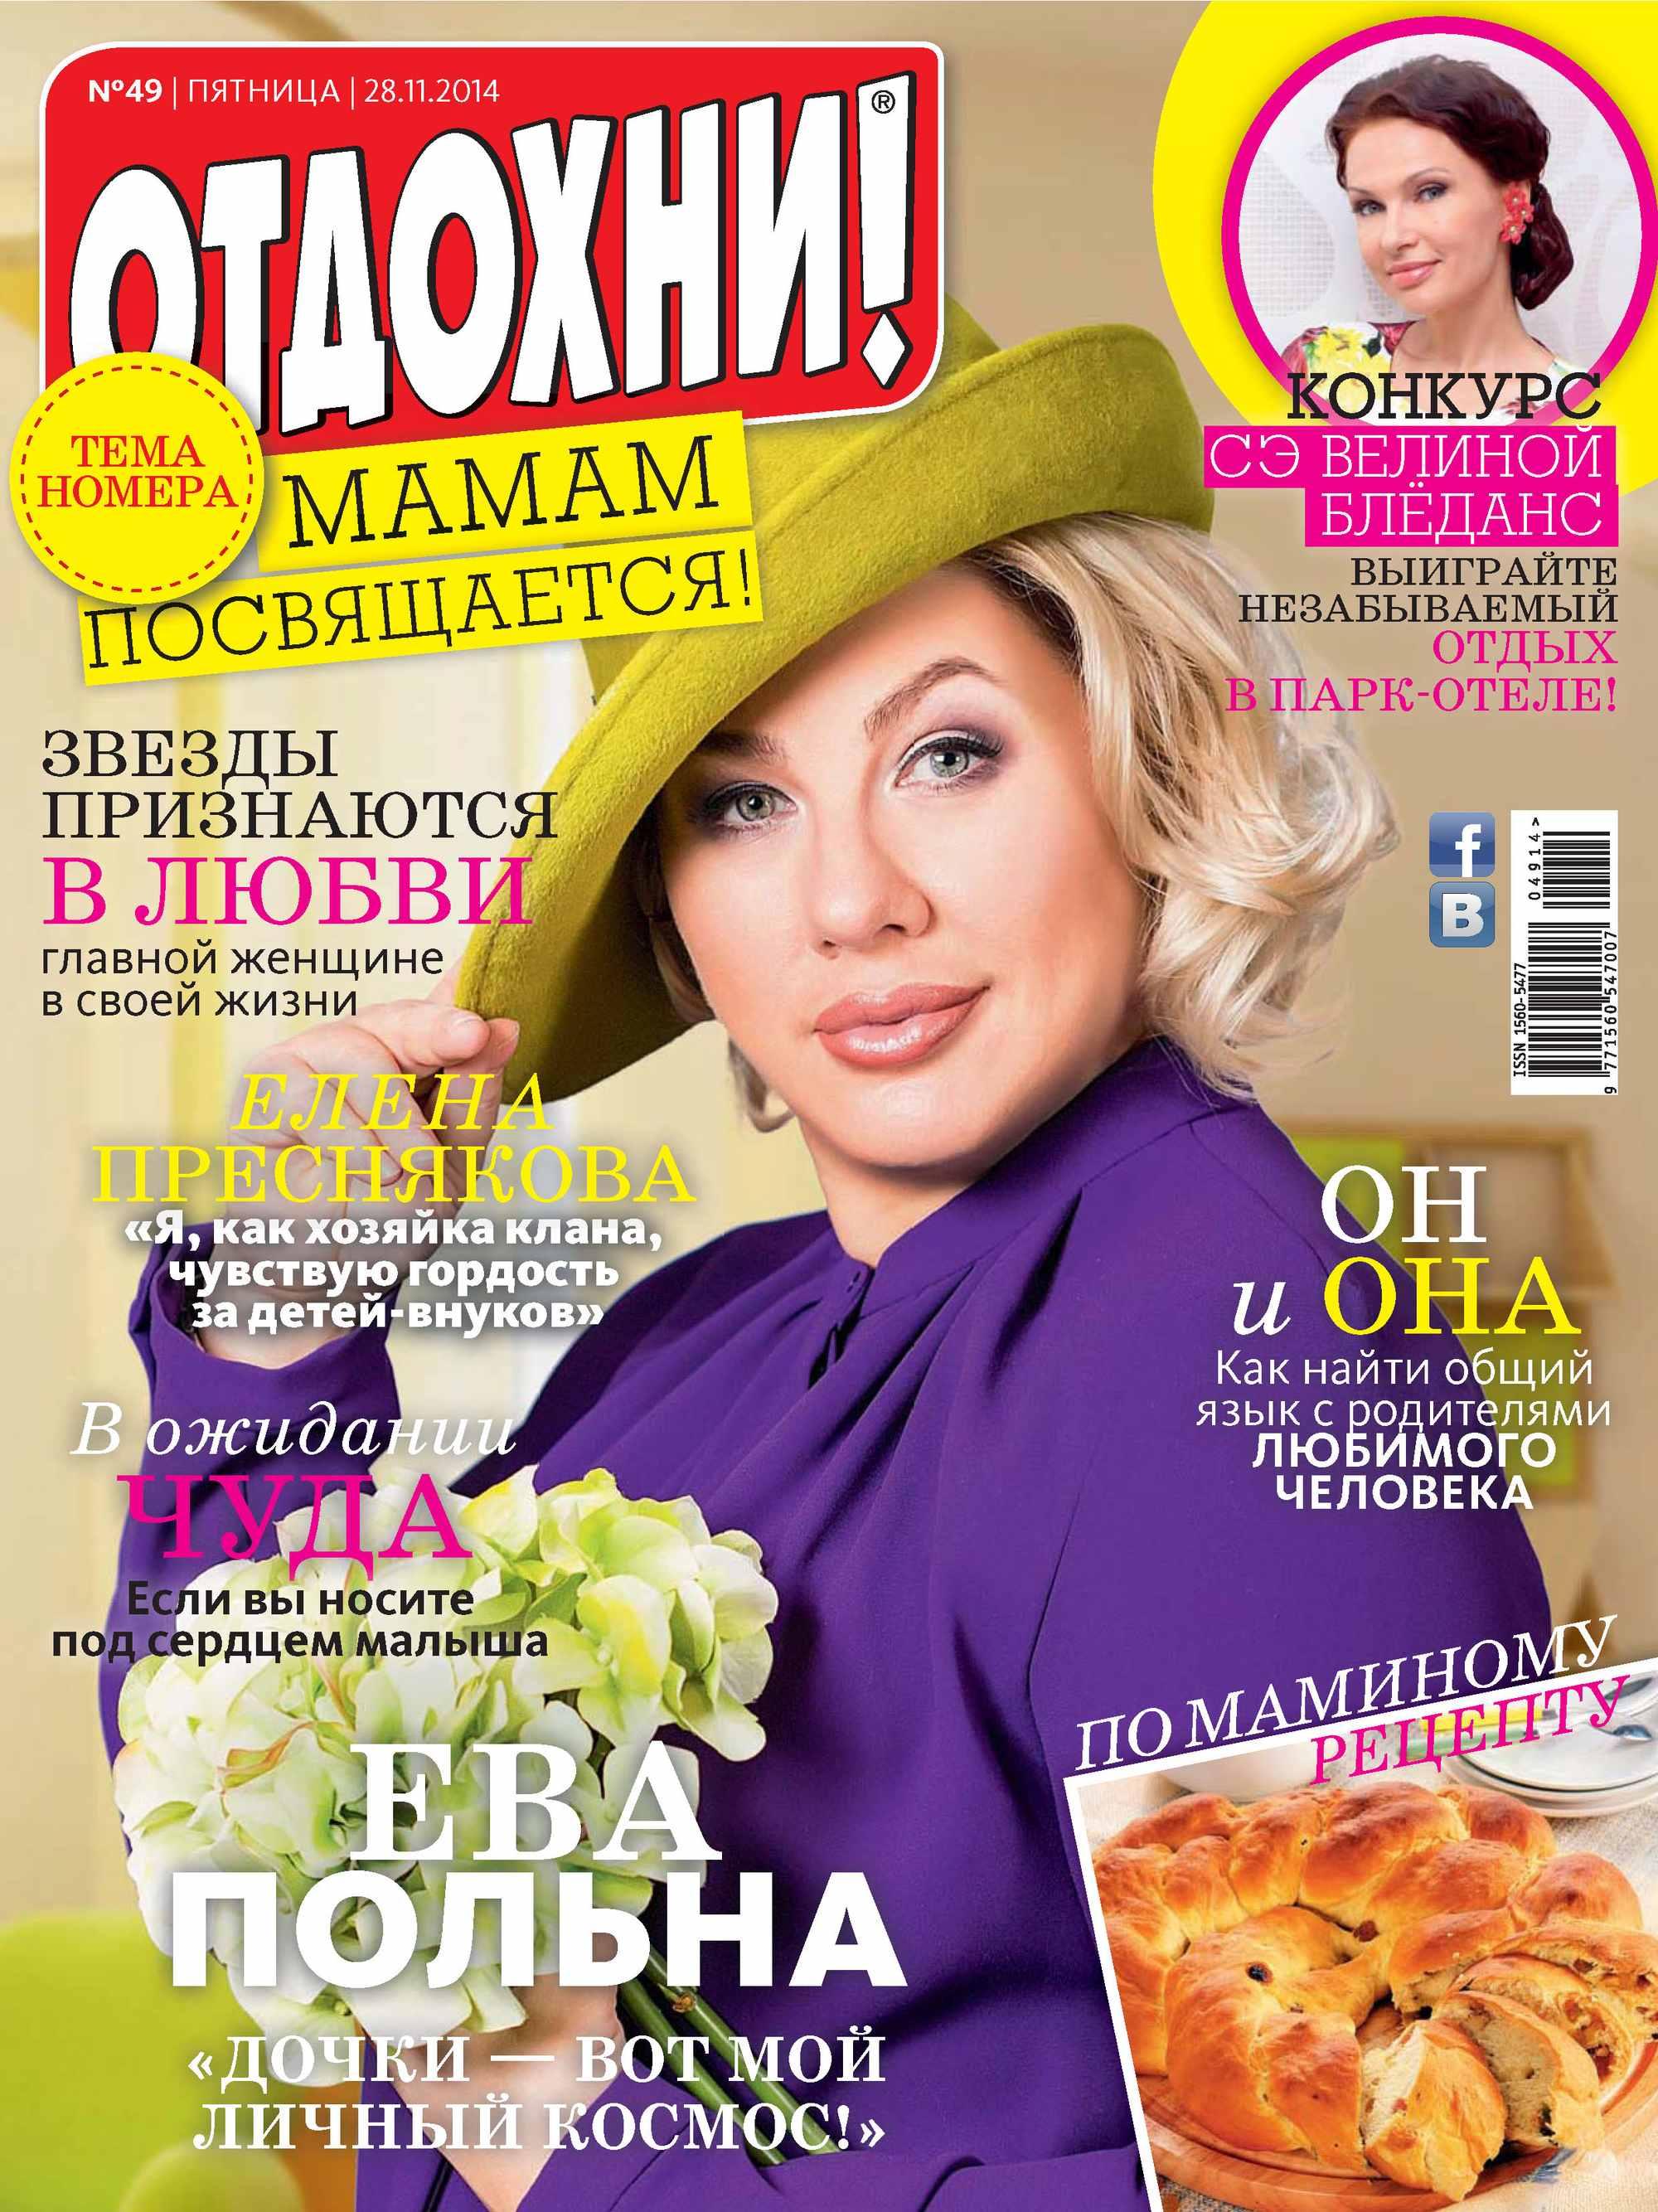 ИД «Бурда» Журнал «Отдохни!» №49/2014 ид бурда журнал отдохни 33 2014